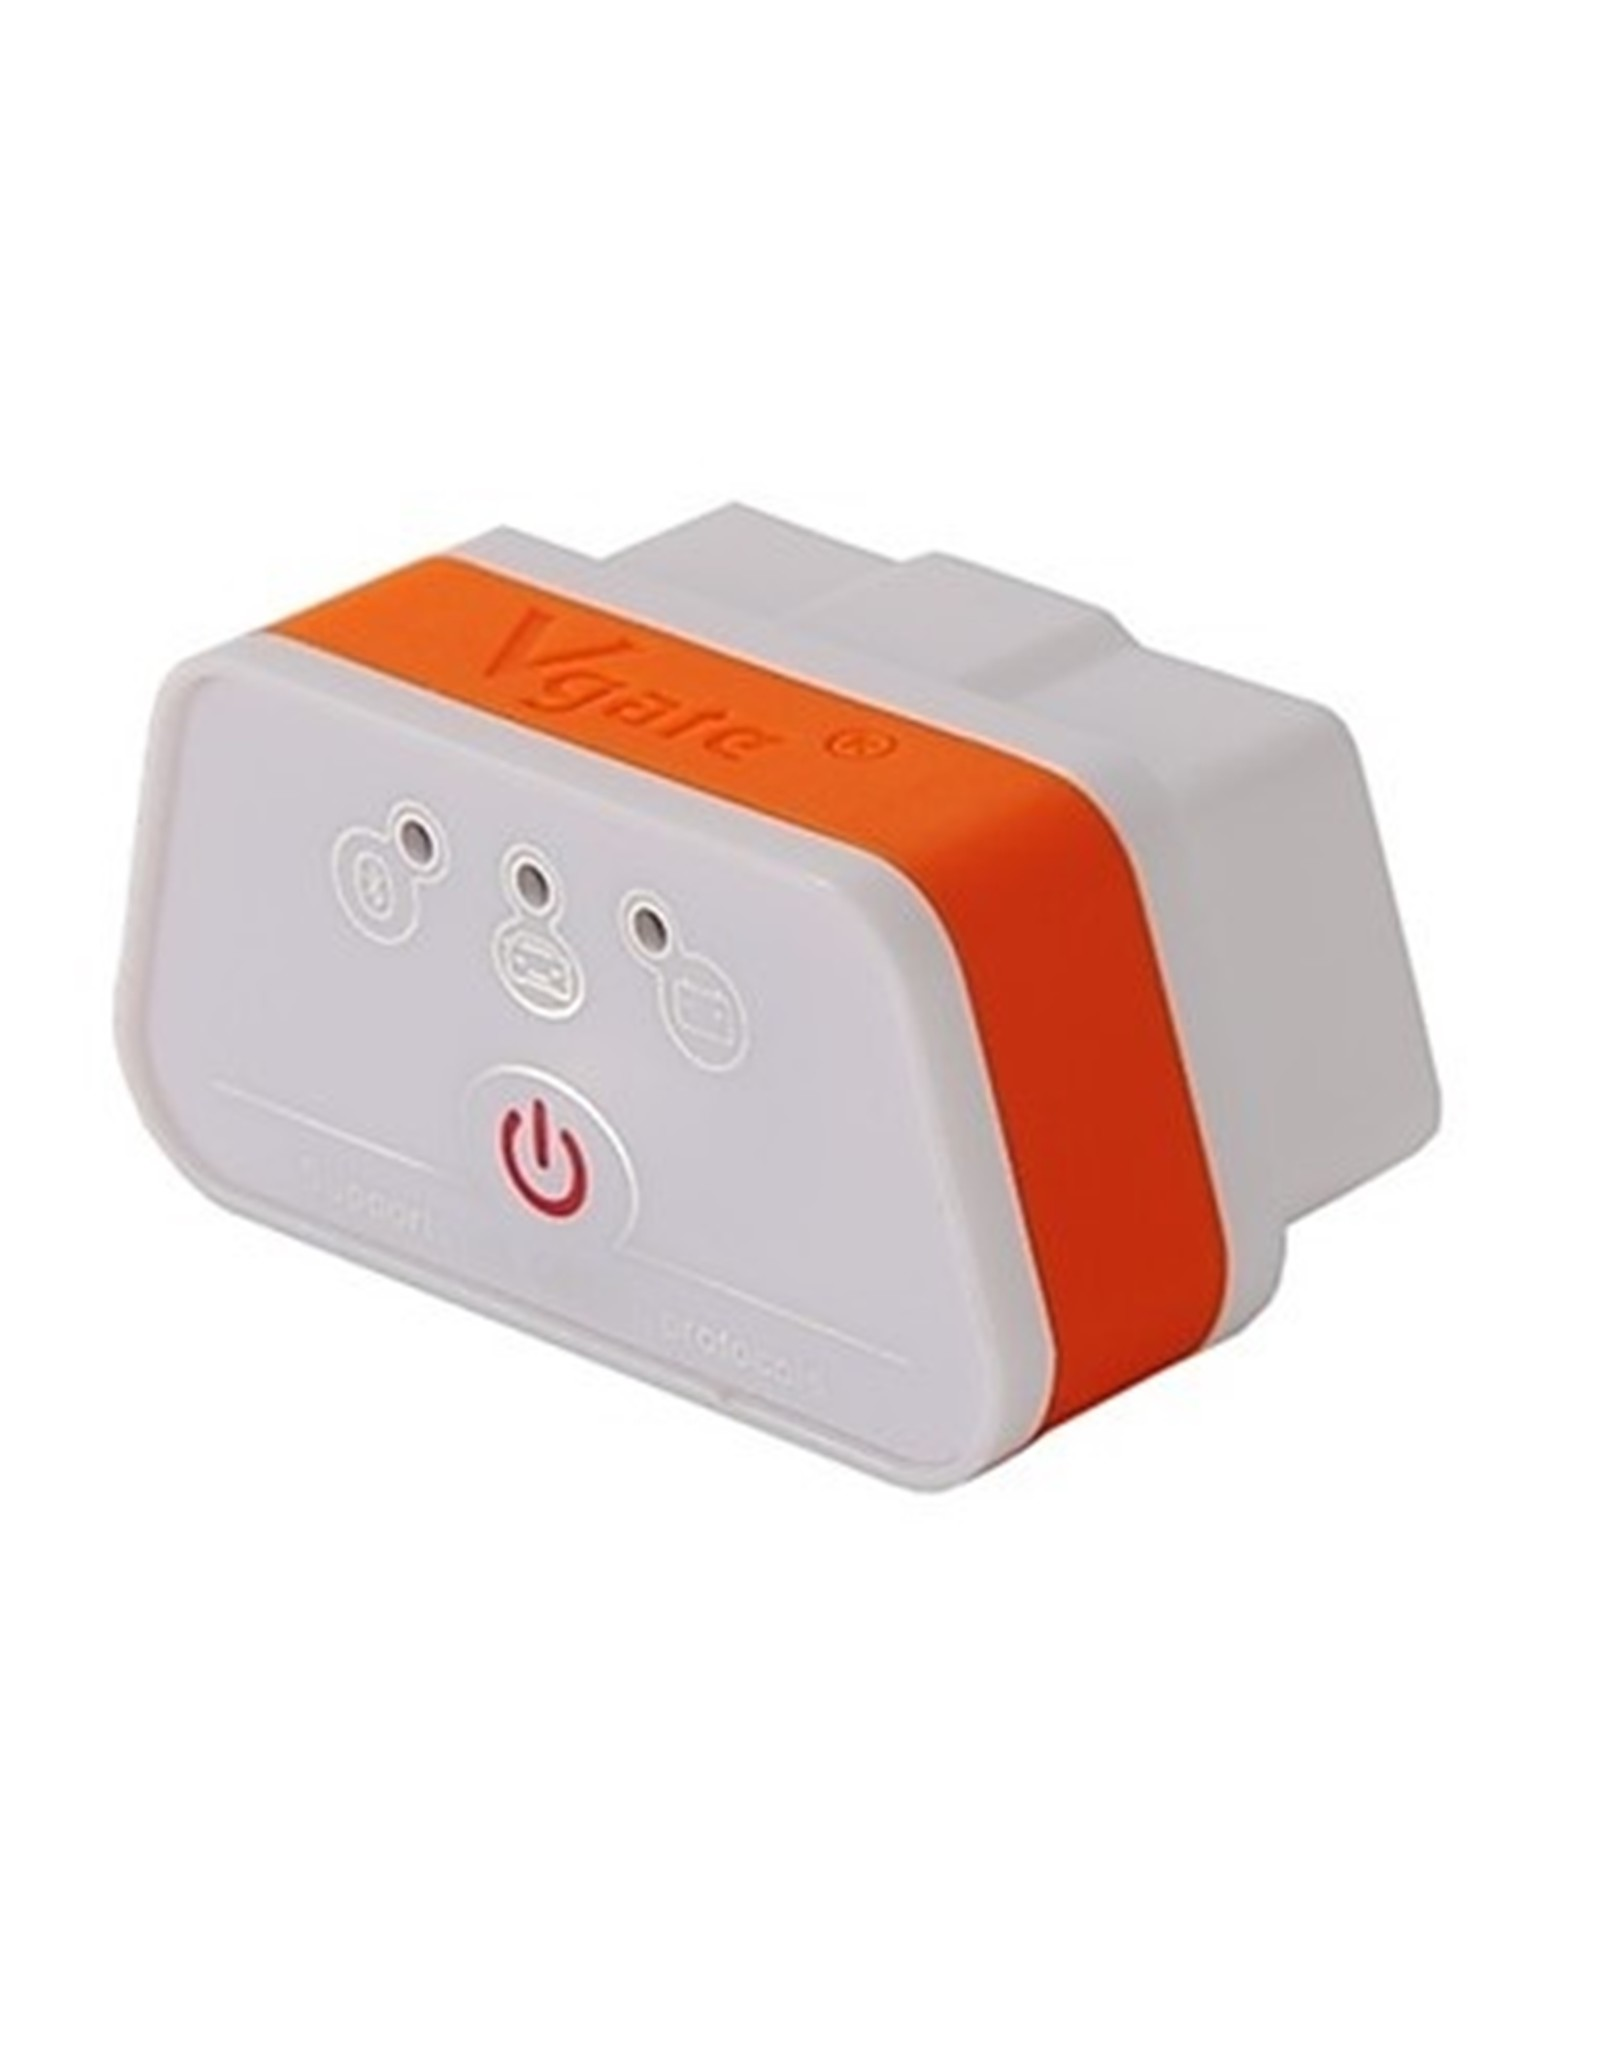 Vgate iCar ELM327 Bluetooth Scan Diagnose Tool